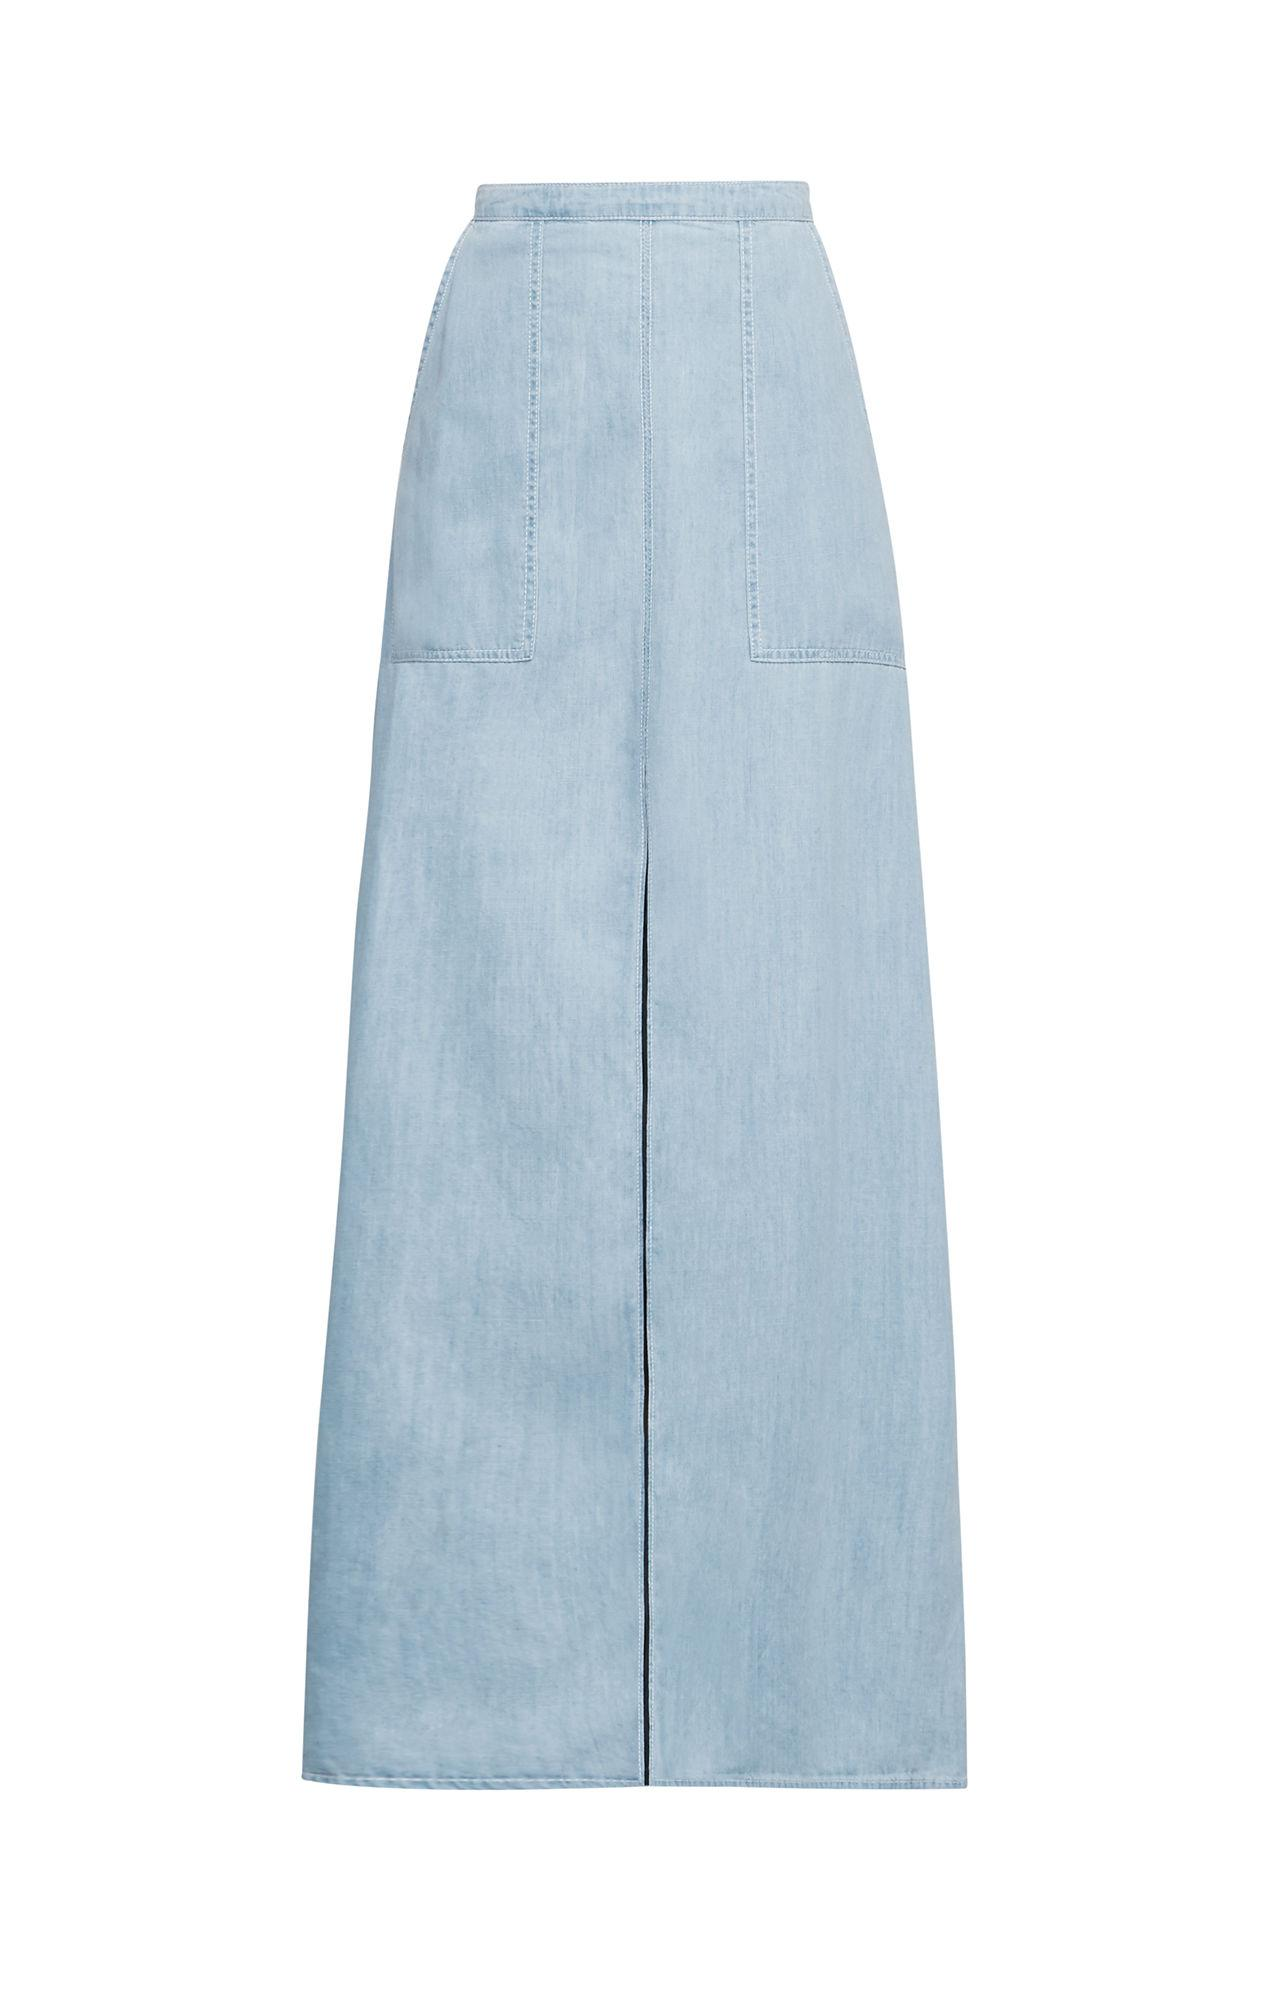 0aca3dafb Gallery. Previously sold at: BCBGMAXAZRIA · Women's Denim Skirts